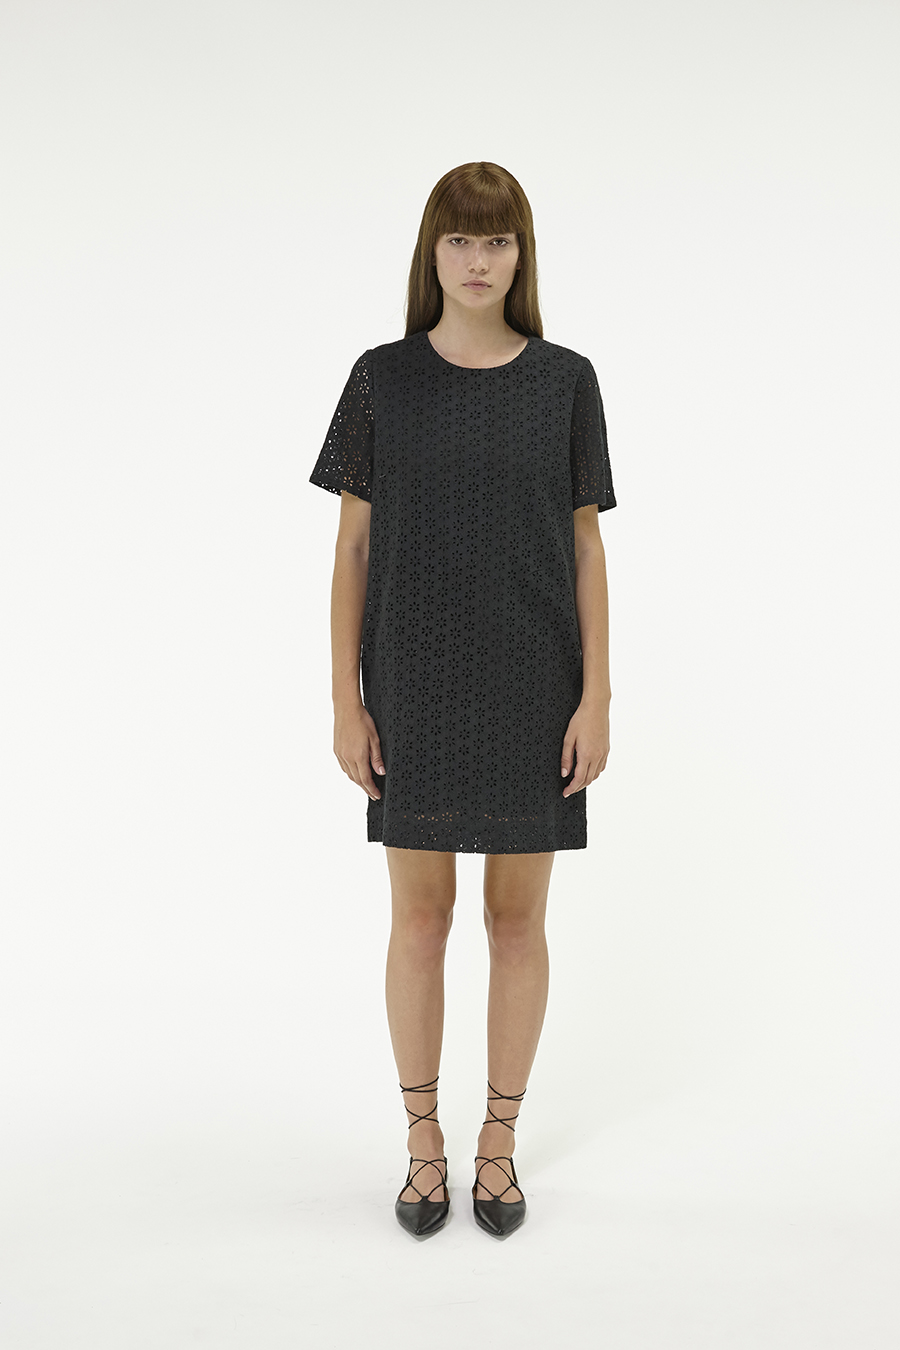 Huffer_Q3-16_W-Hope-Shell-Dress_Black-01